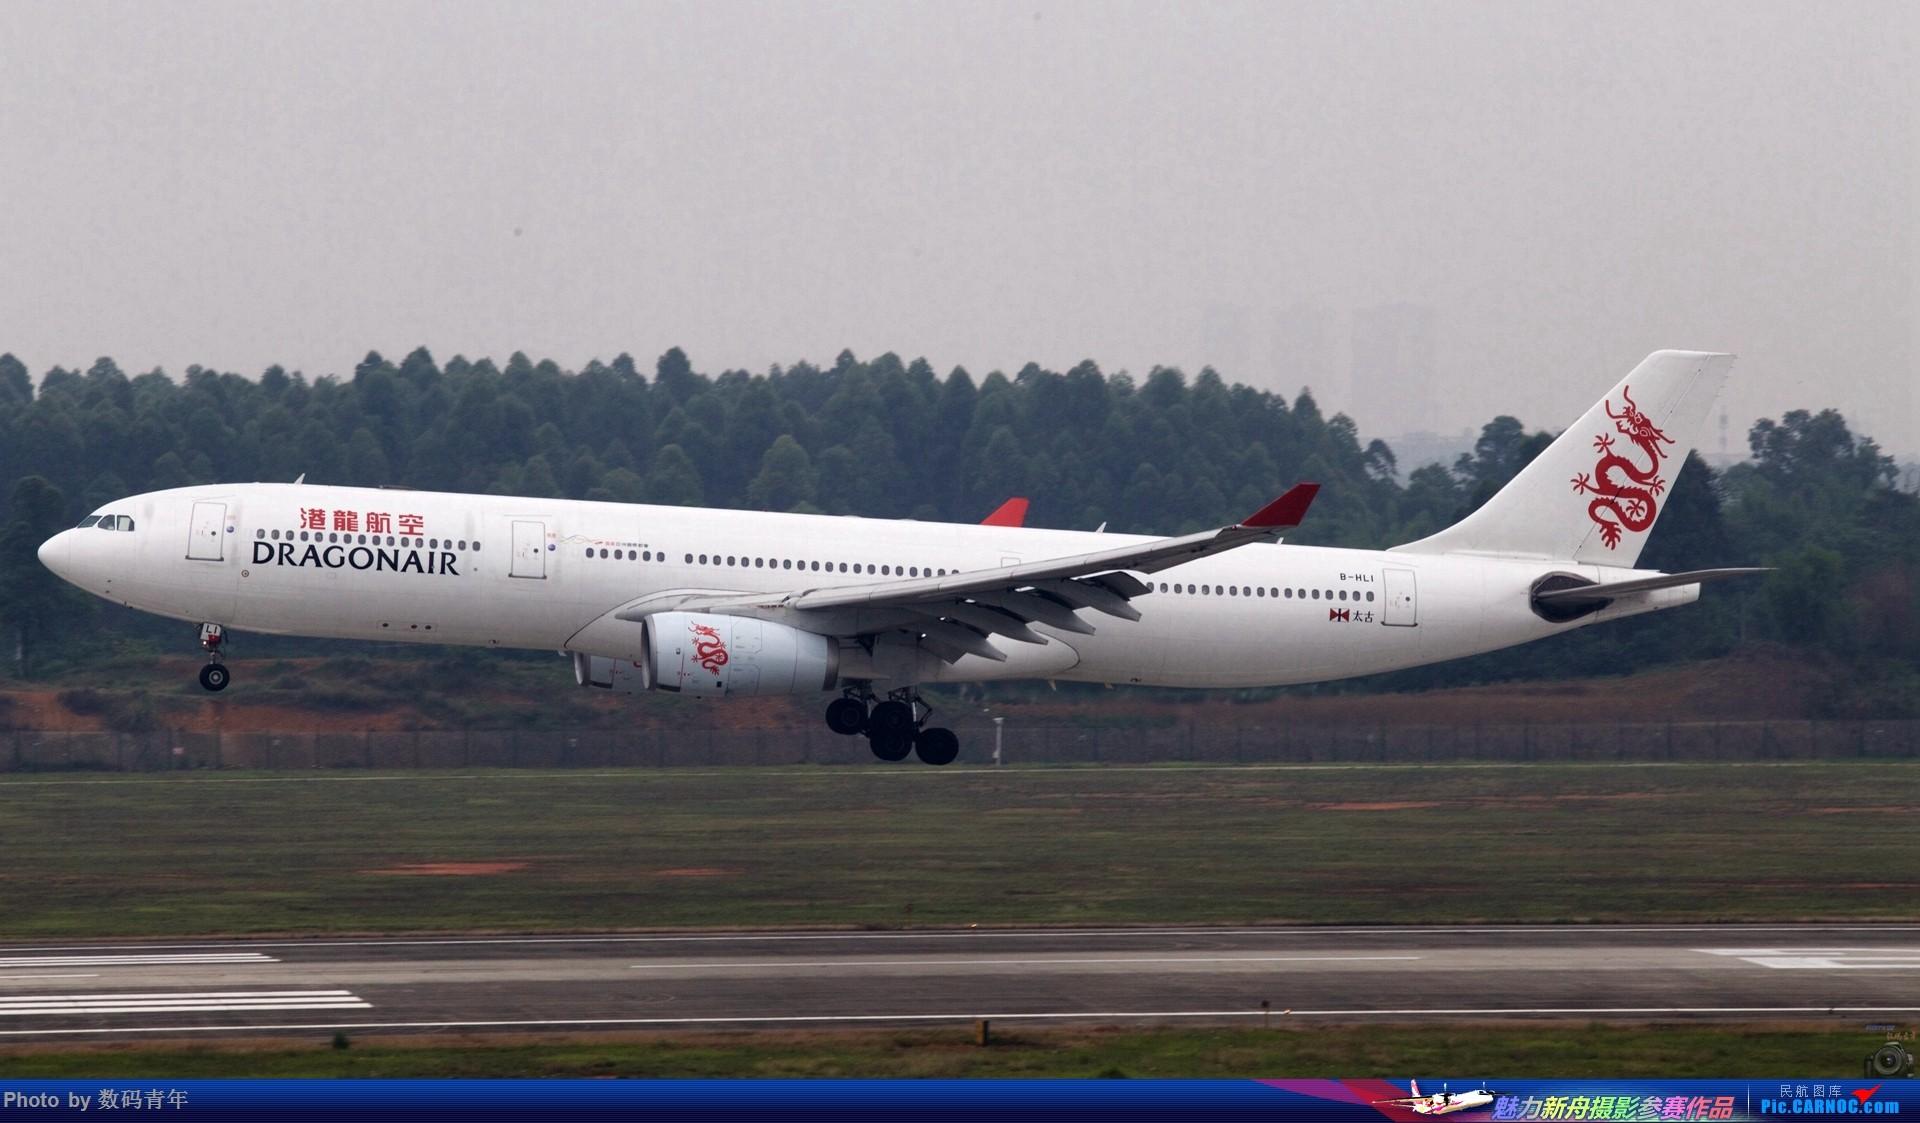 Re:[原创]重出江湖【CTU】2015.5.17打飞机 AIRBUS A330-300 B-HLI 中国成都双流国际机场